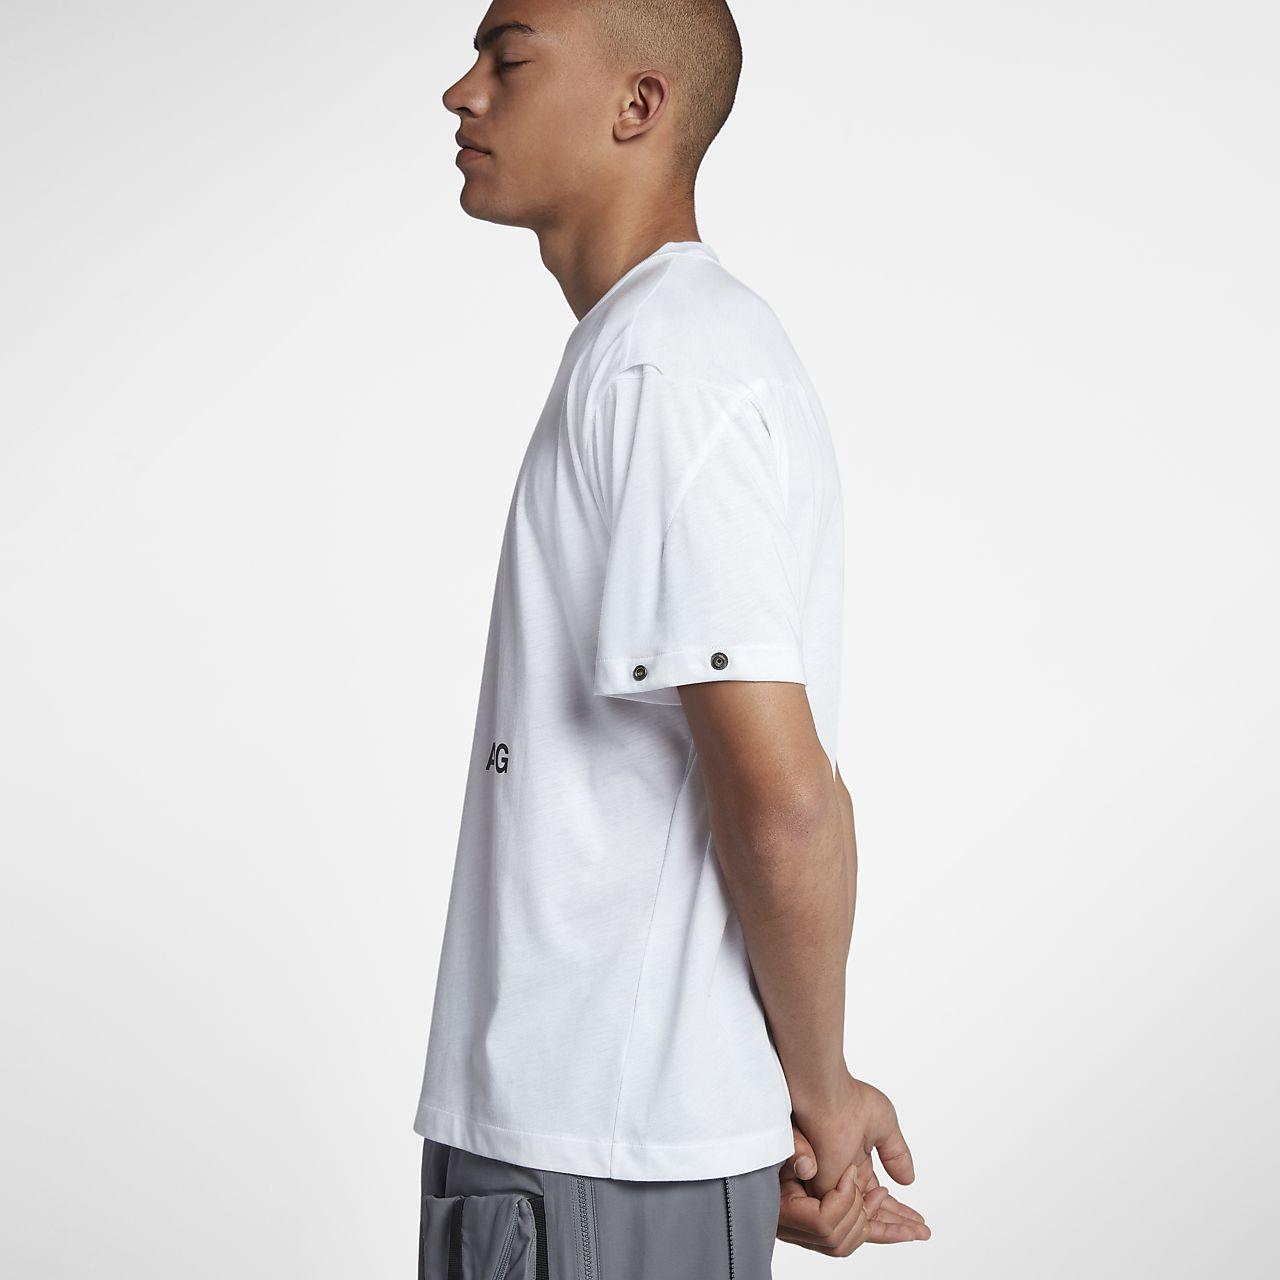 779d8442 NikeLab ACG Variable Men's T-Shirt. Nike.com ID